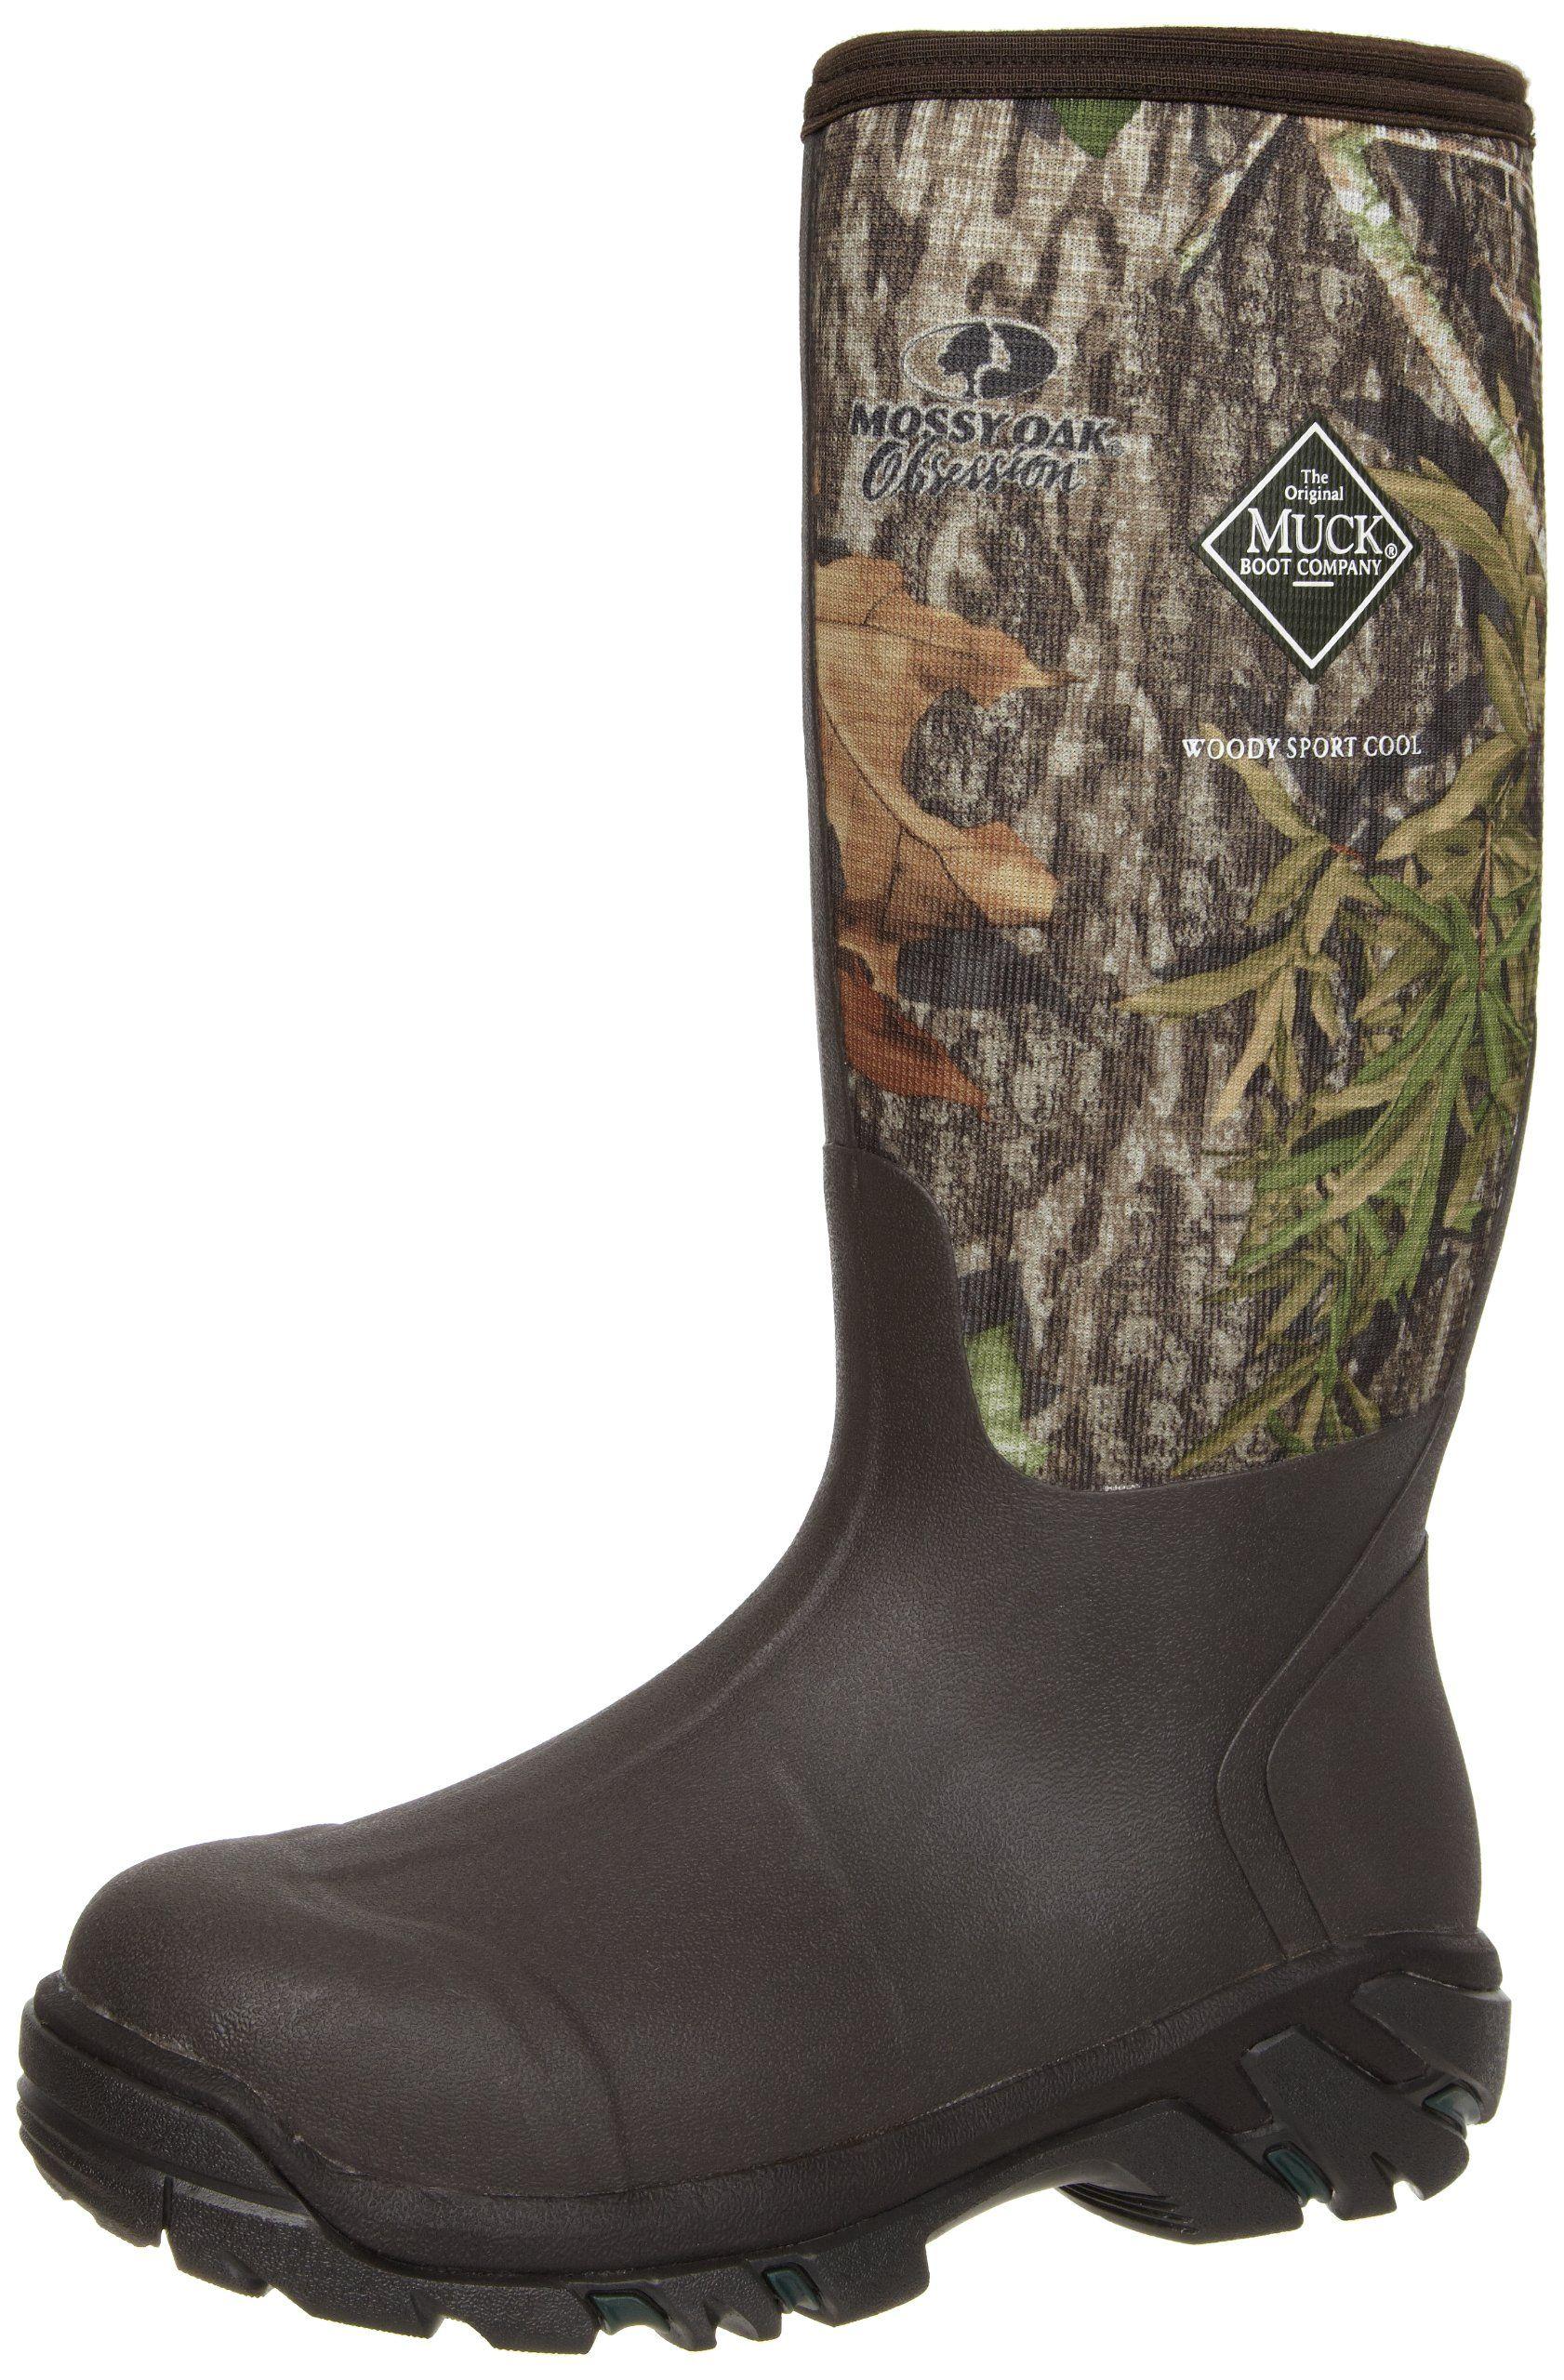 MuckBoots Woody Sport Cool Hunting Boot,Mossy Oak Obsession,7 M US Mens/